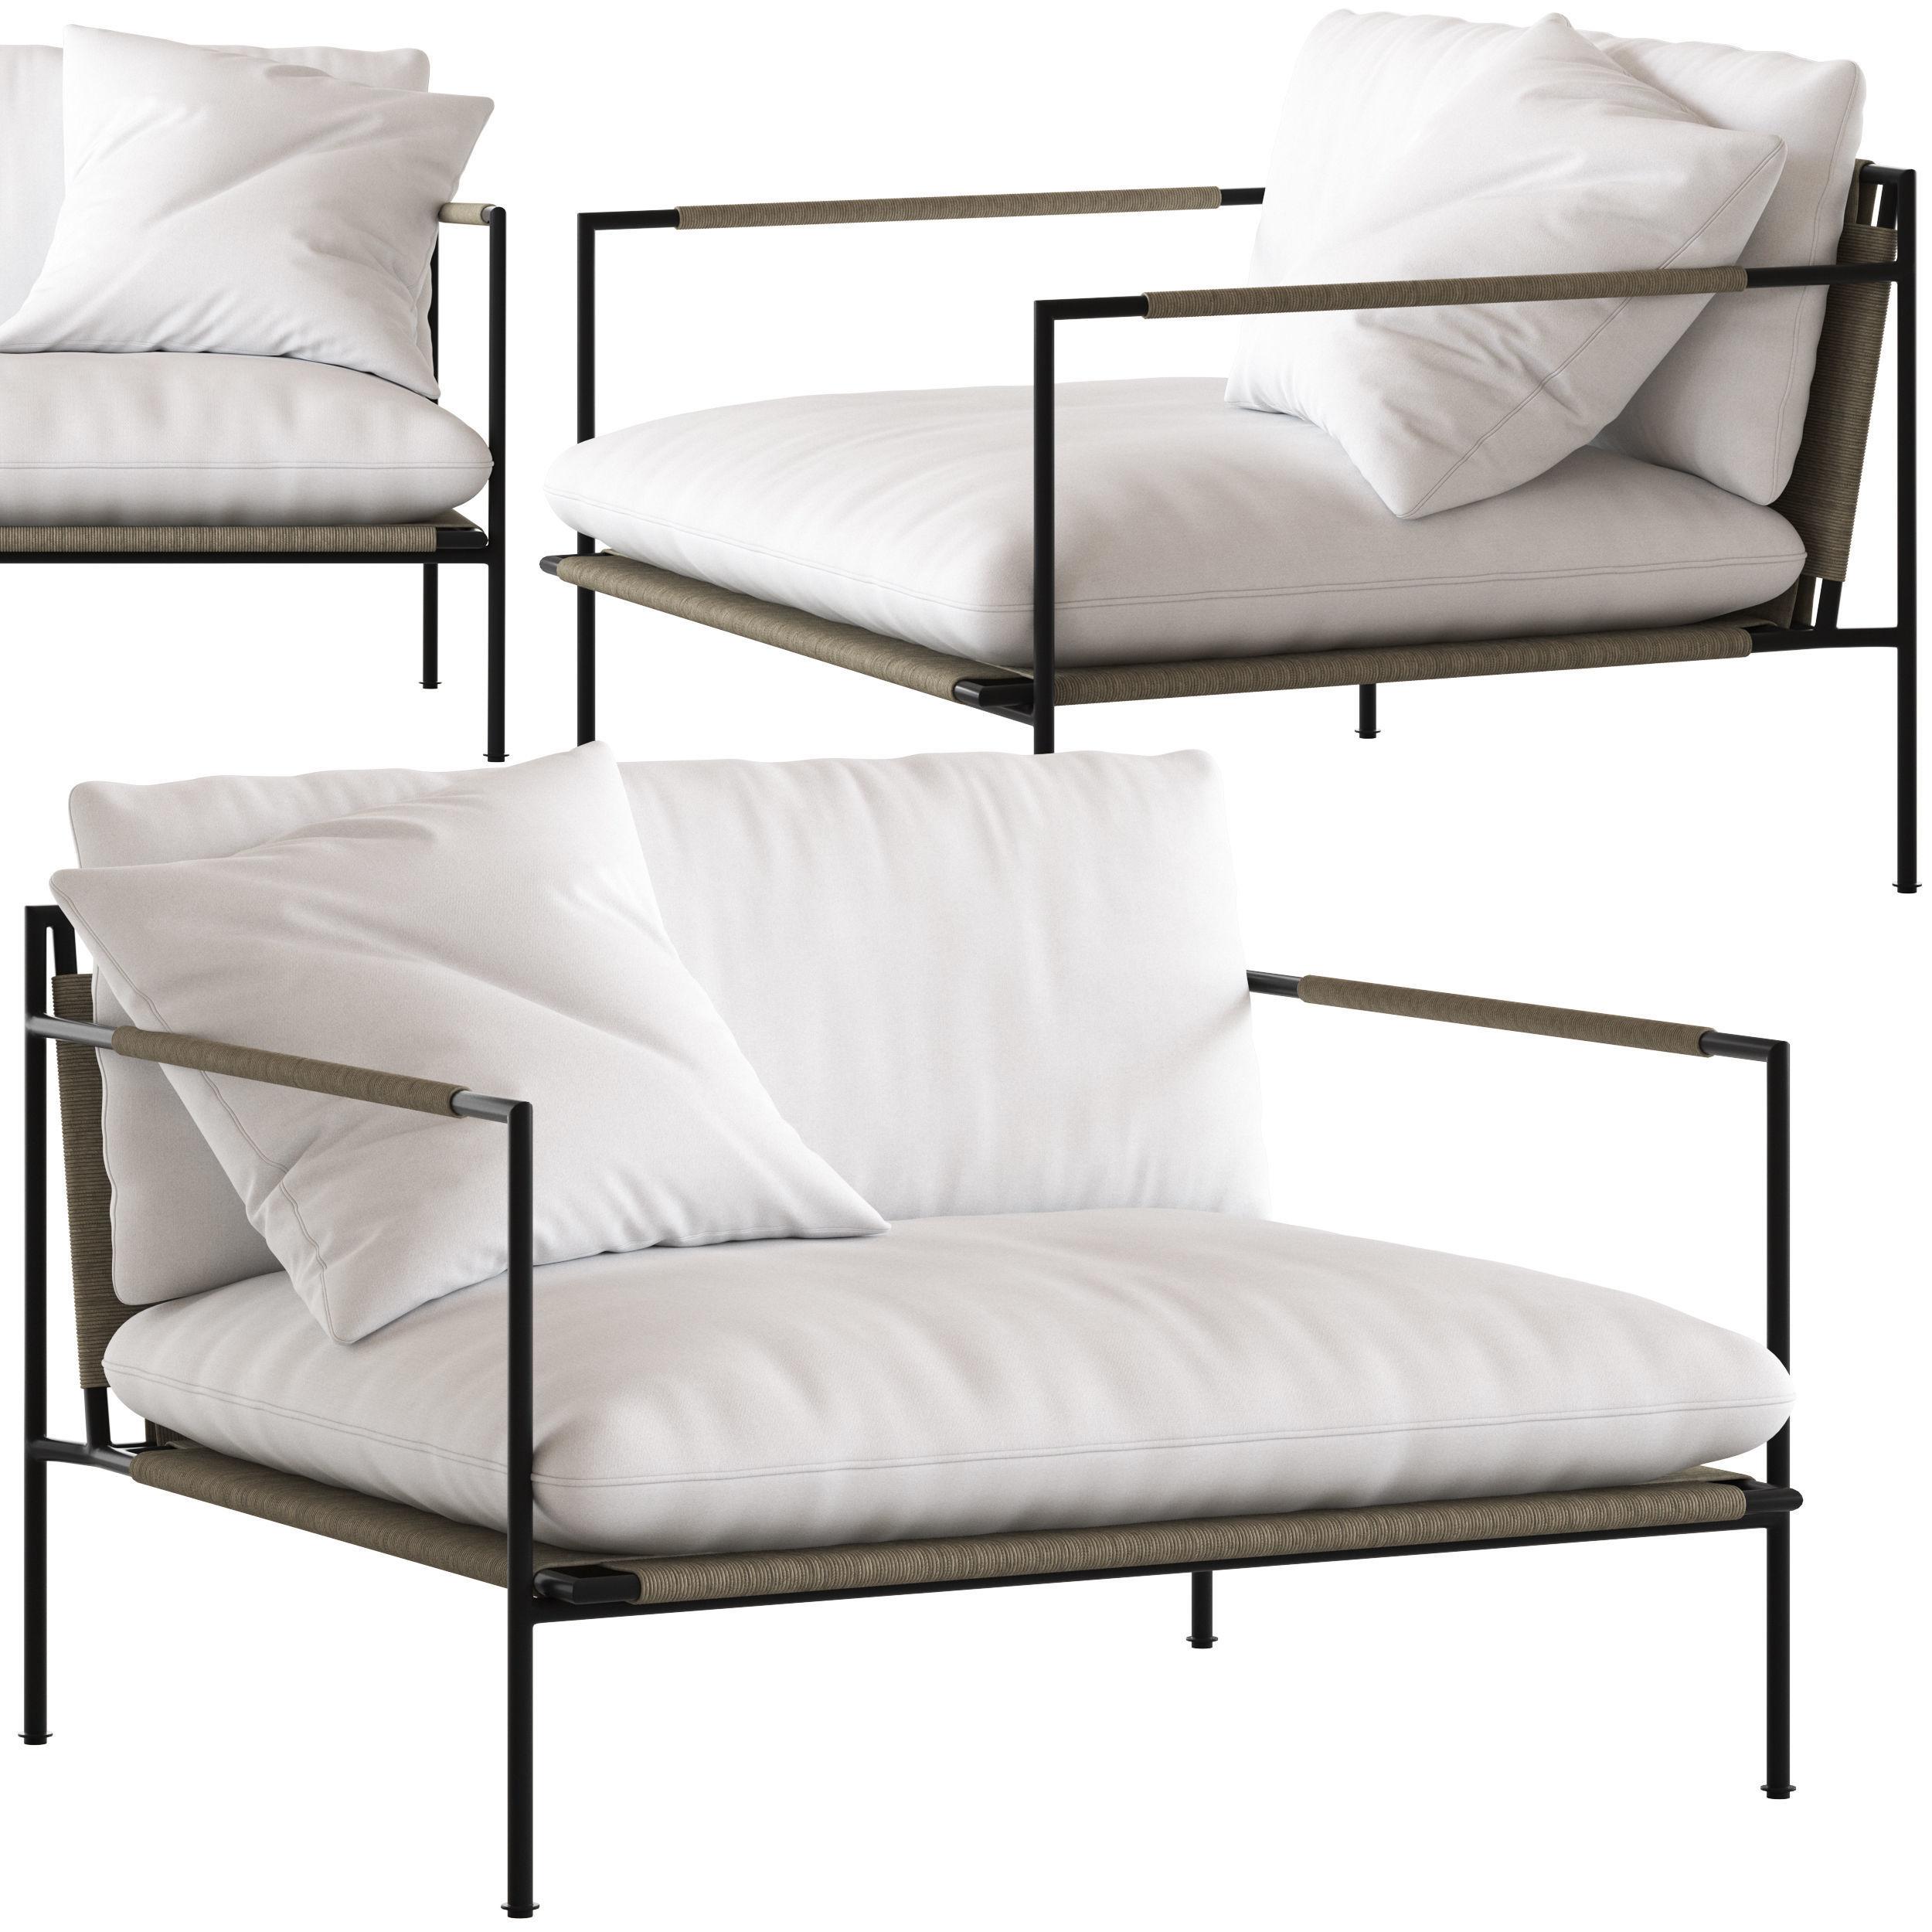 Coco Republic Malmo Outdoor Lounge Chair